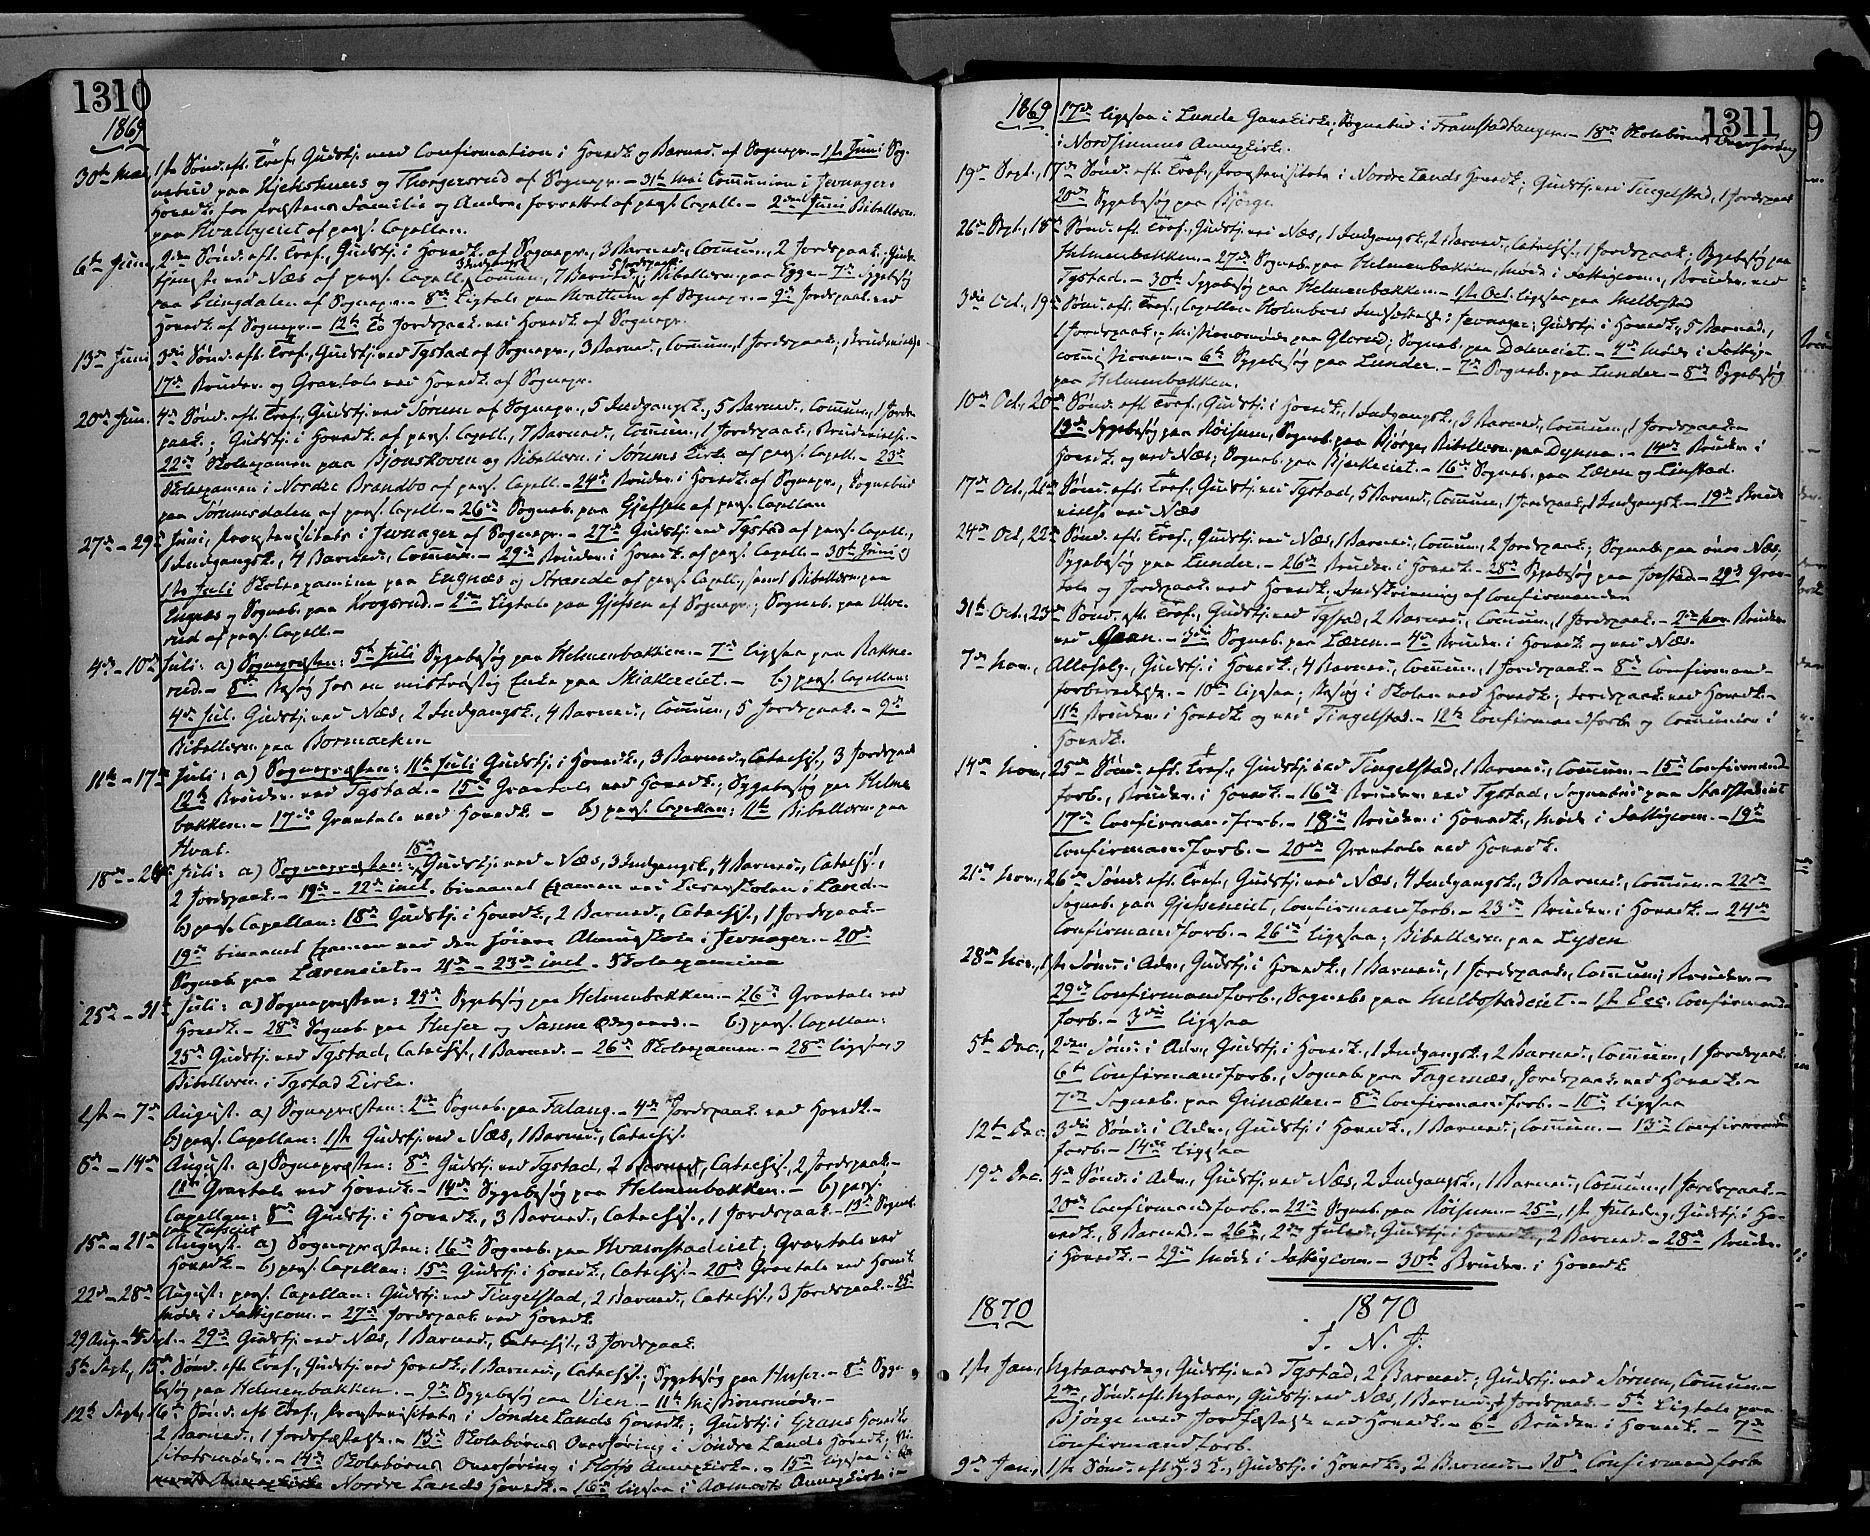 SAH, Gran prestekontor, Ministerialbok nr. 12, 1856-1874, s. 1310-1311